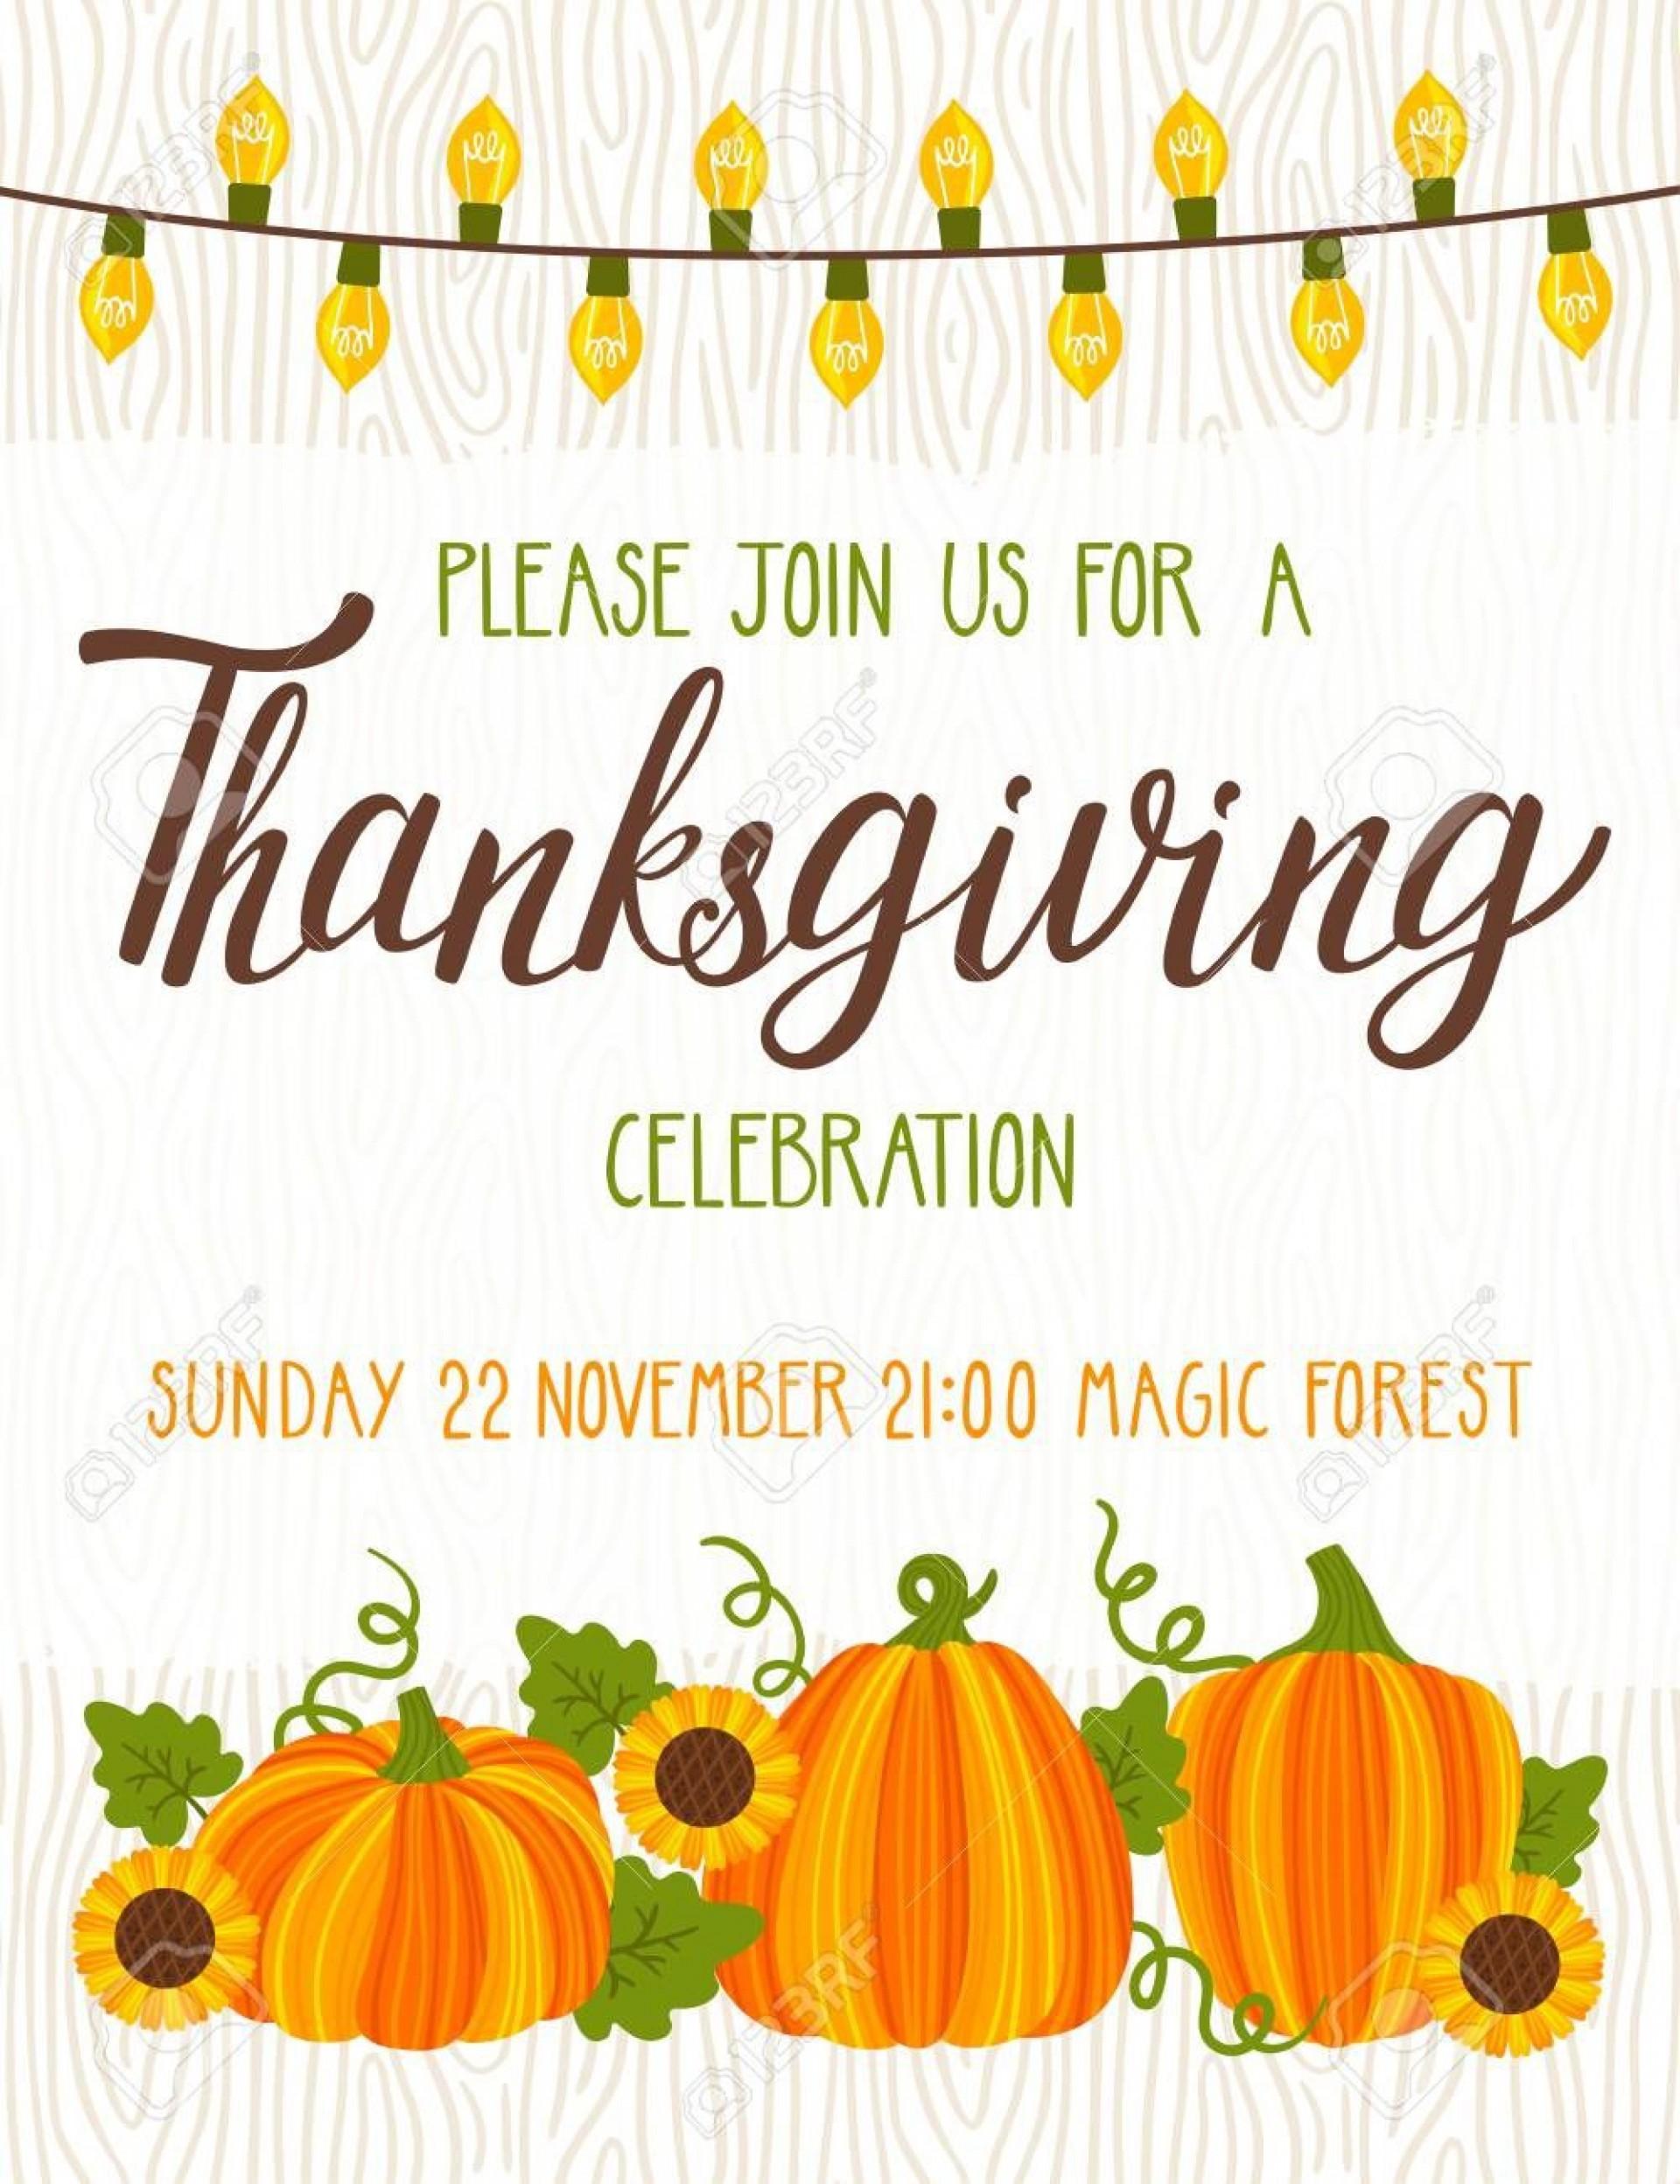 003 Astounding Free Thanksgiving Invitation Template Design  Templates Printable Dinner Download Potluck1920